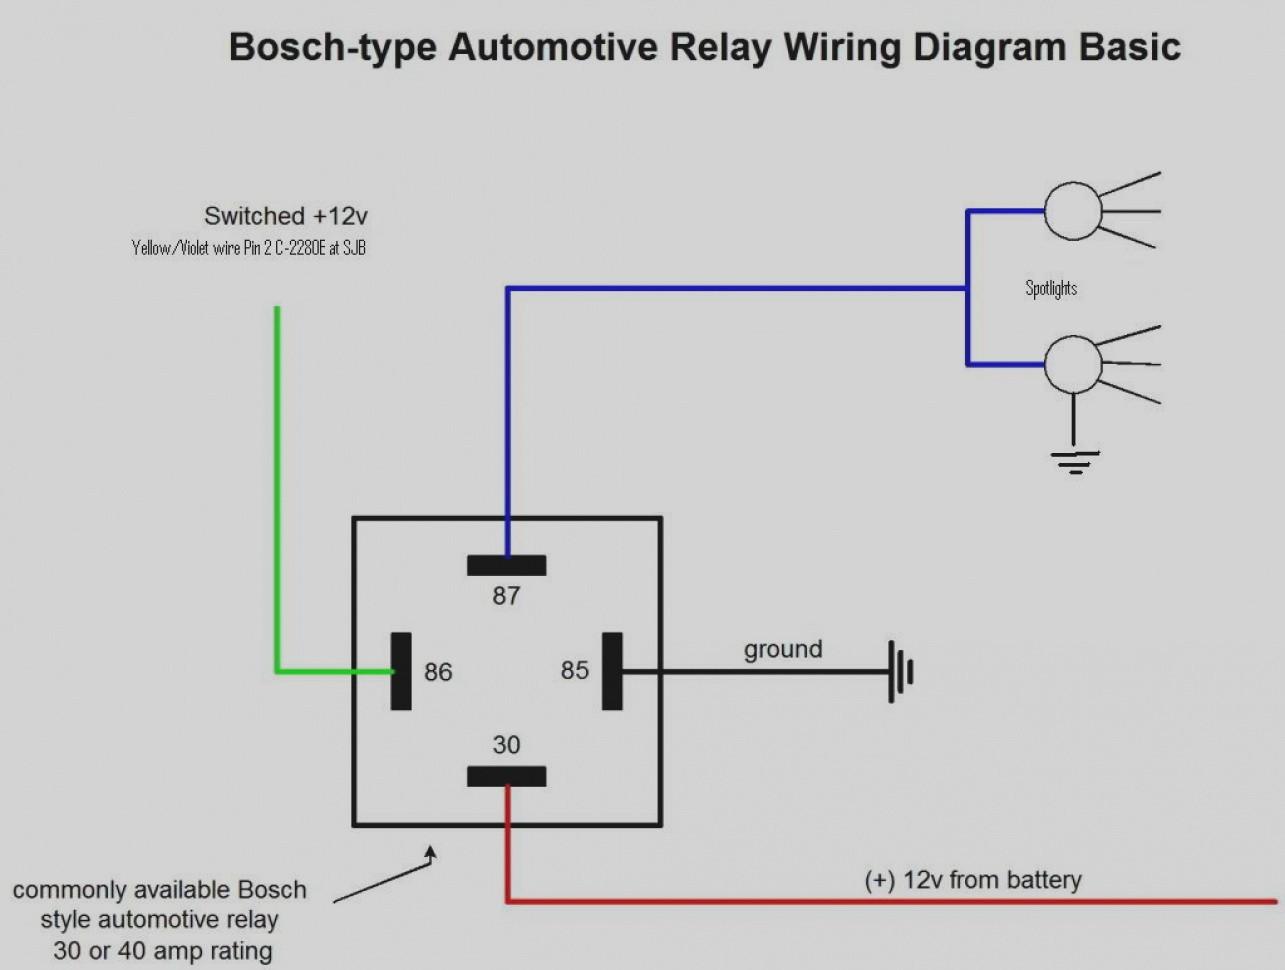 12vdc Relay Wiring Trusted Schematics Diagram Hid 12v 5 Pin Unique Image